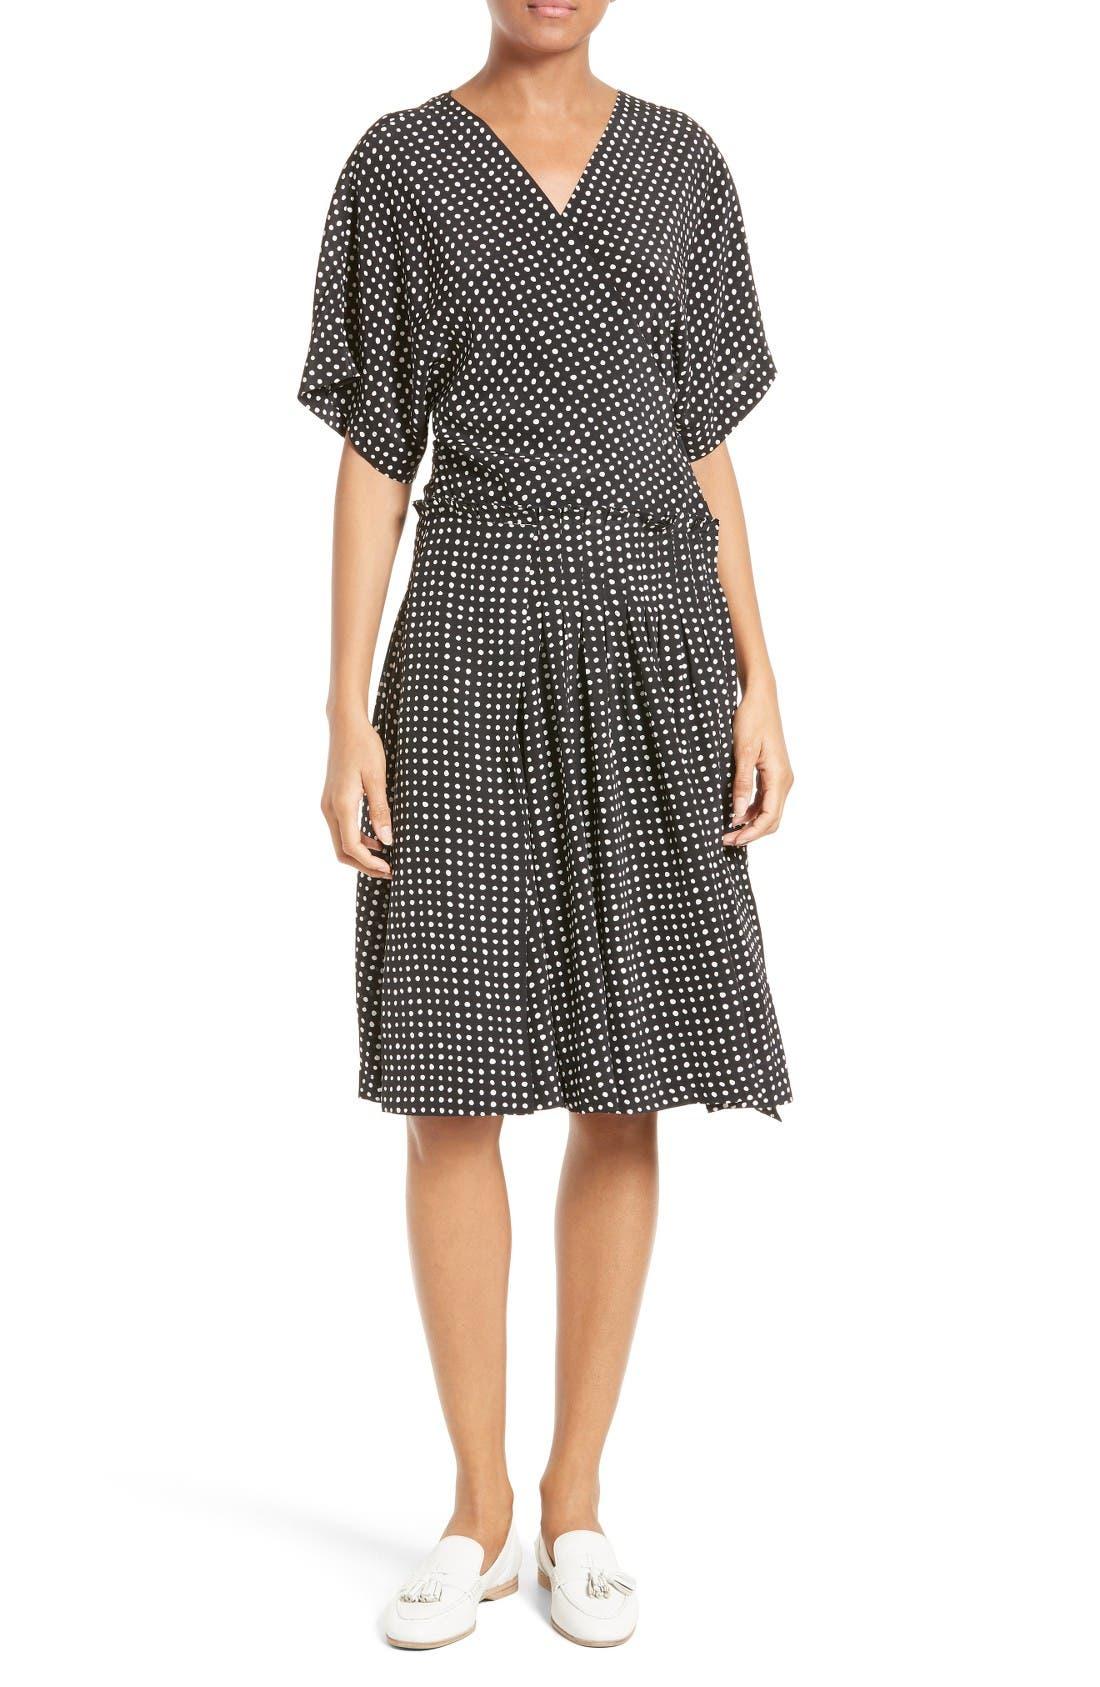 Alternate Image 1 Selected - Diane von Furstenberg Polka Dot Silk D-Ring Wrap Dress